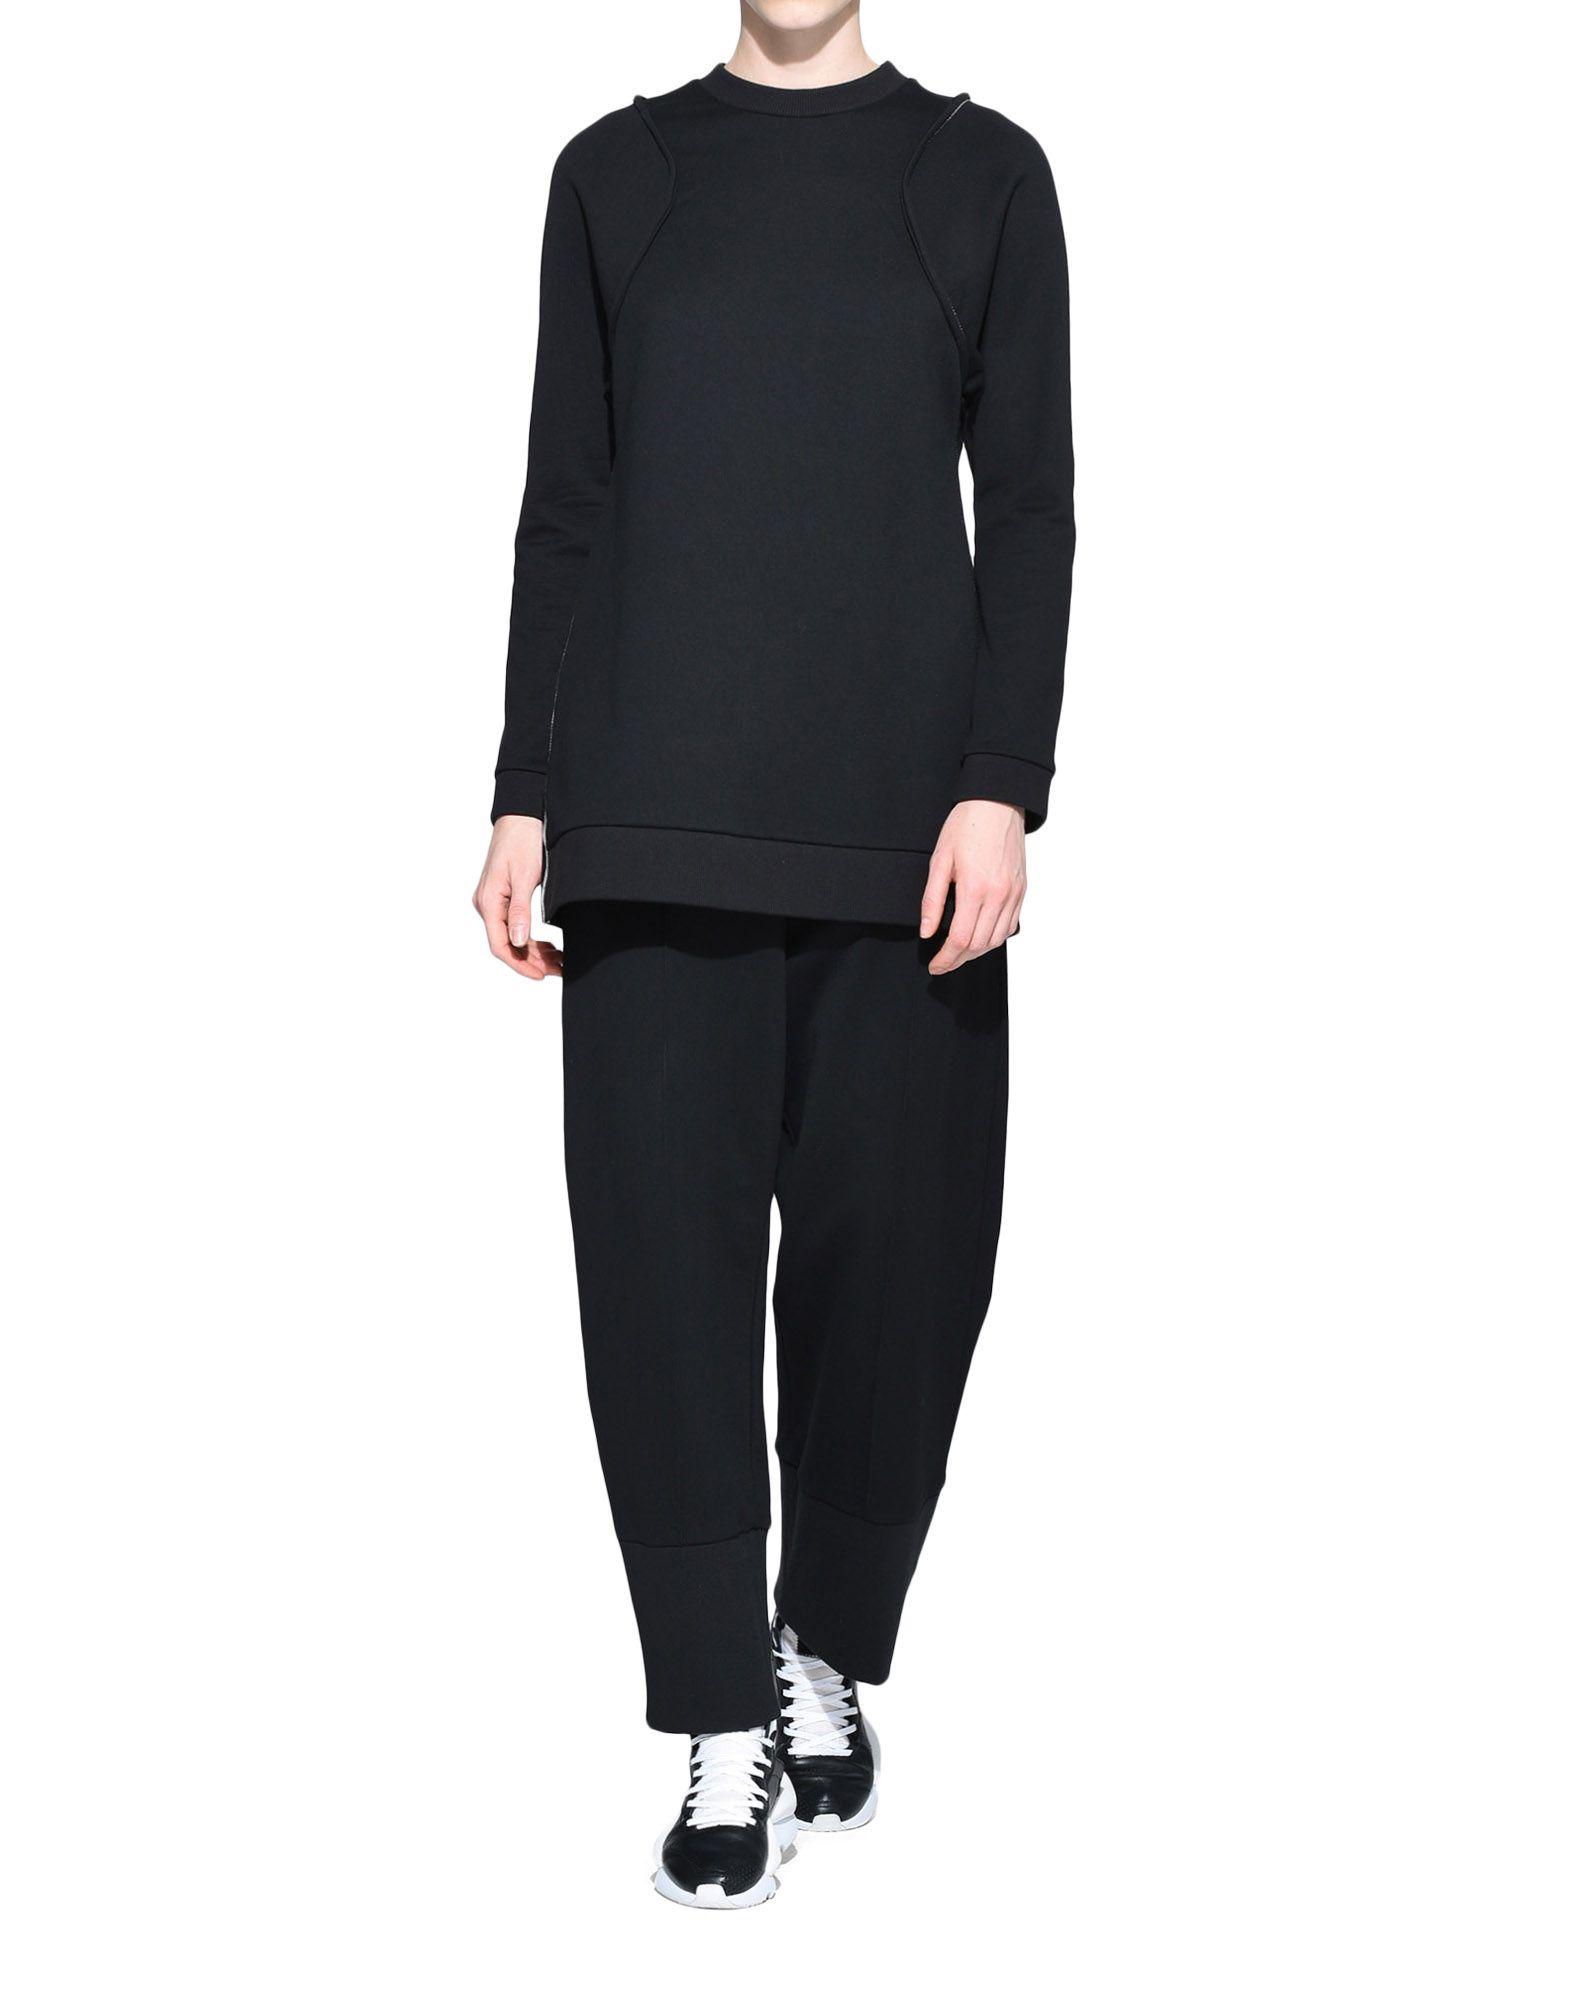 Y-3 Y-3 Sashiko Sweater Sweatshirt Woman a